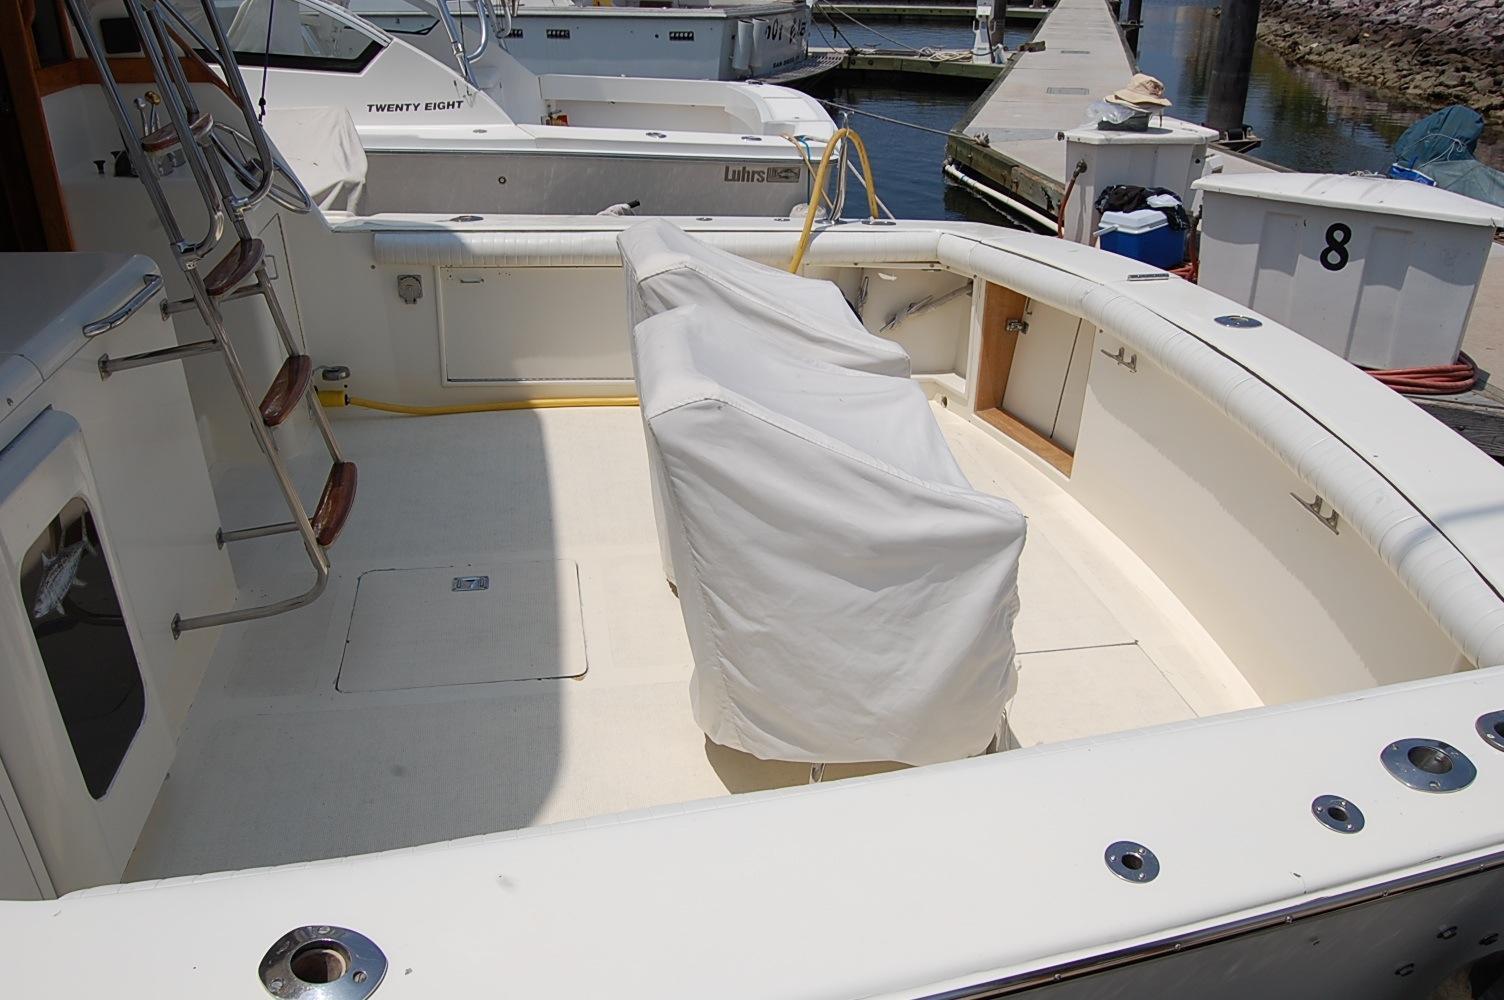 48' Ocean Yachts Super Sport+Cockpit Fridge/ Ice Box